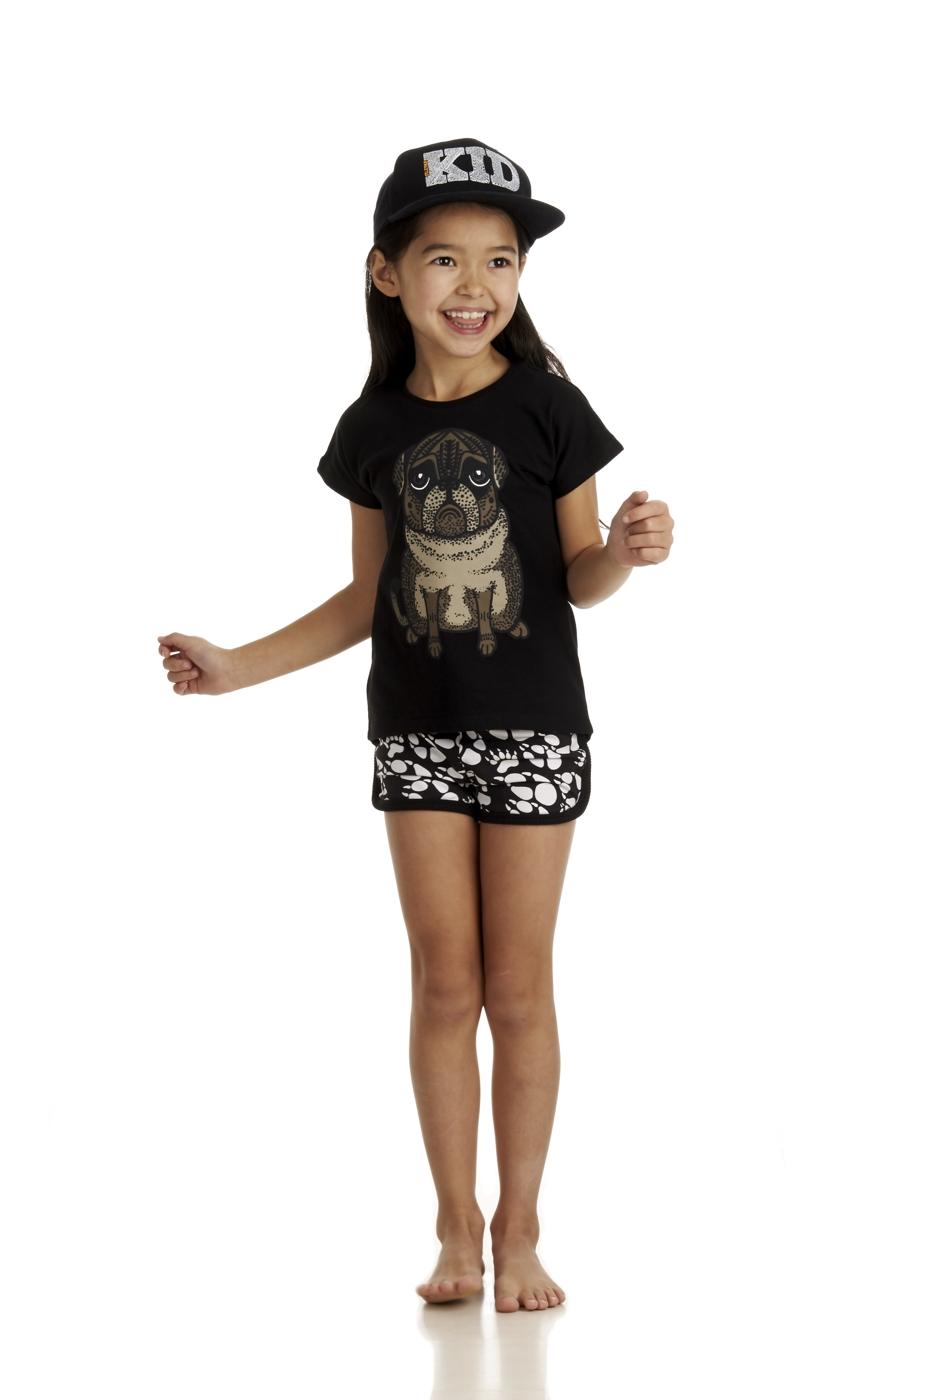 17SSTP T-shirt Pug 17SSSHP Shorts Paws AOP E